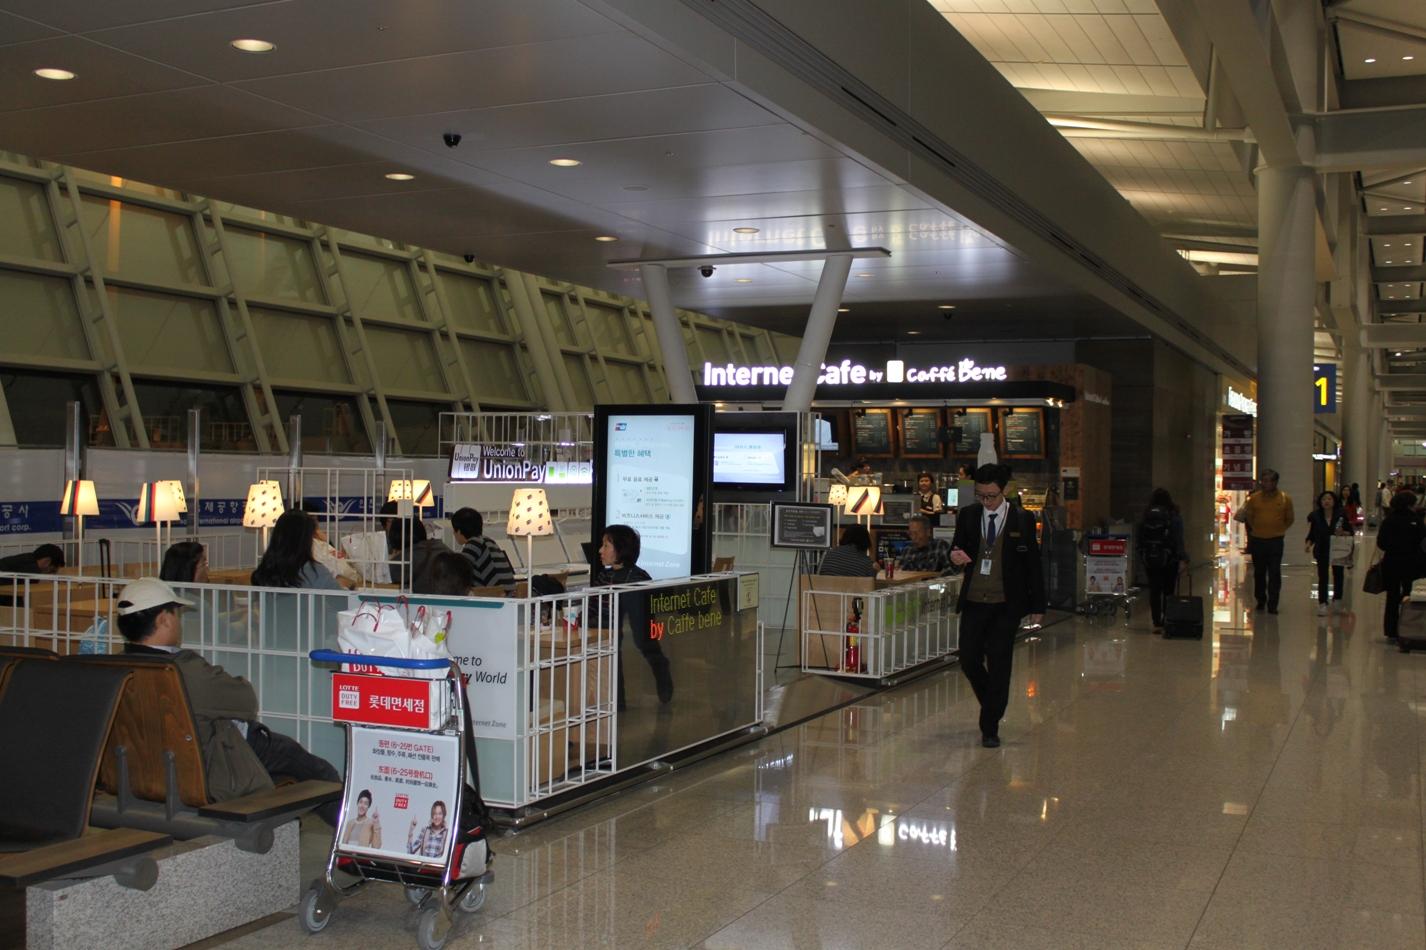 Интернет-кафе в аэропорту Сеул Инчхон